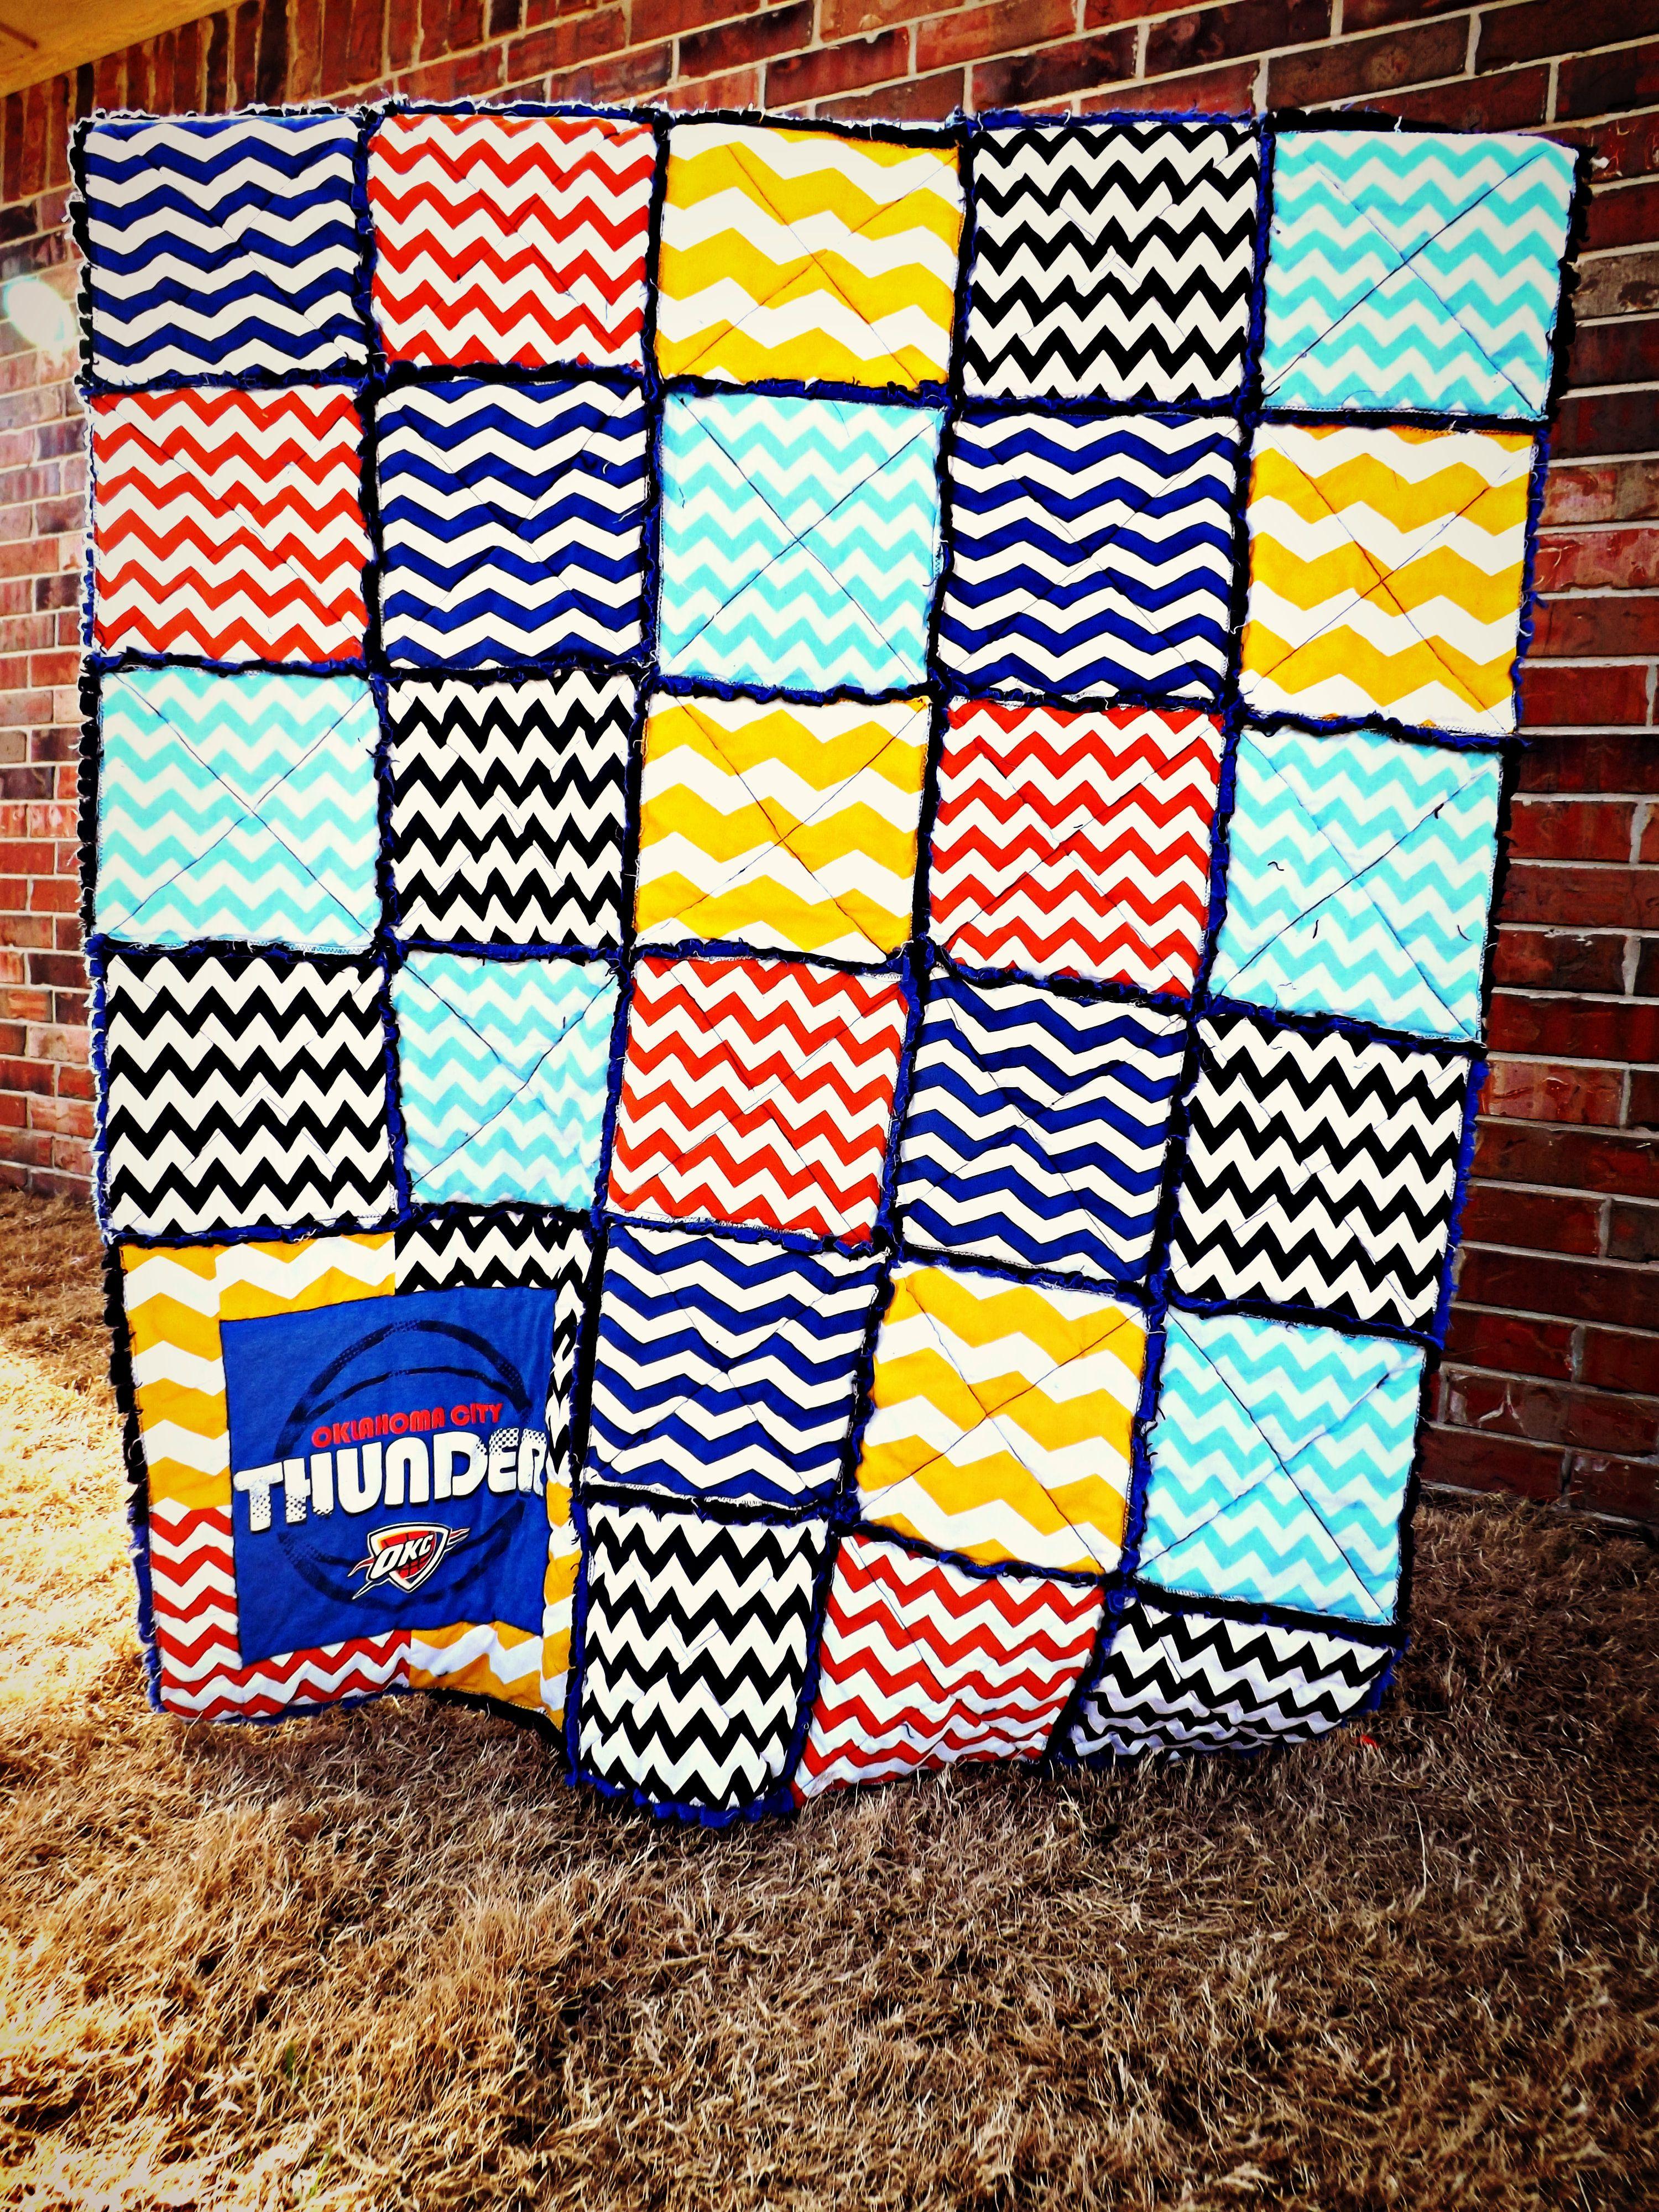 Oklahoma City Thunder rag quilt   My projects   Pinterest ... : quilt city - Adamdwight.com